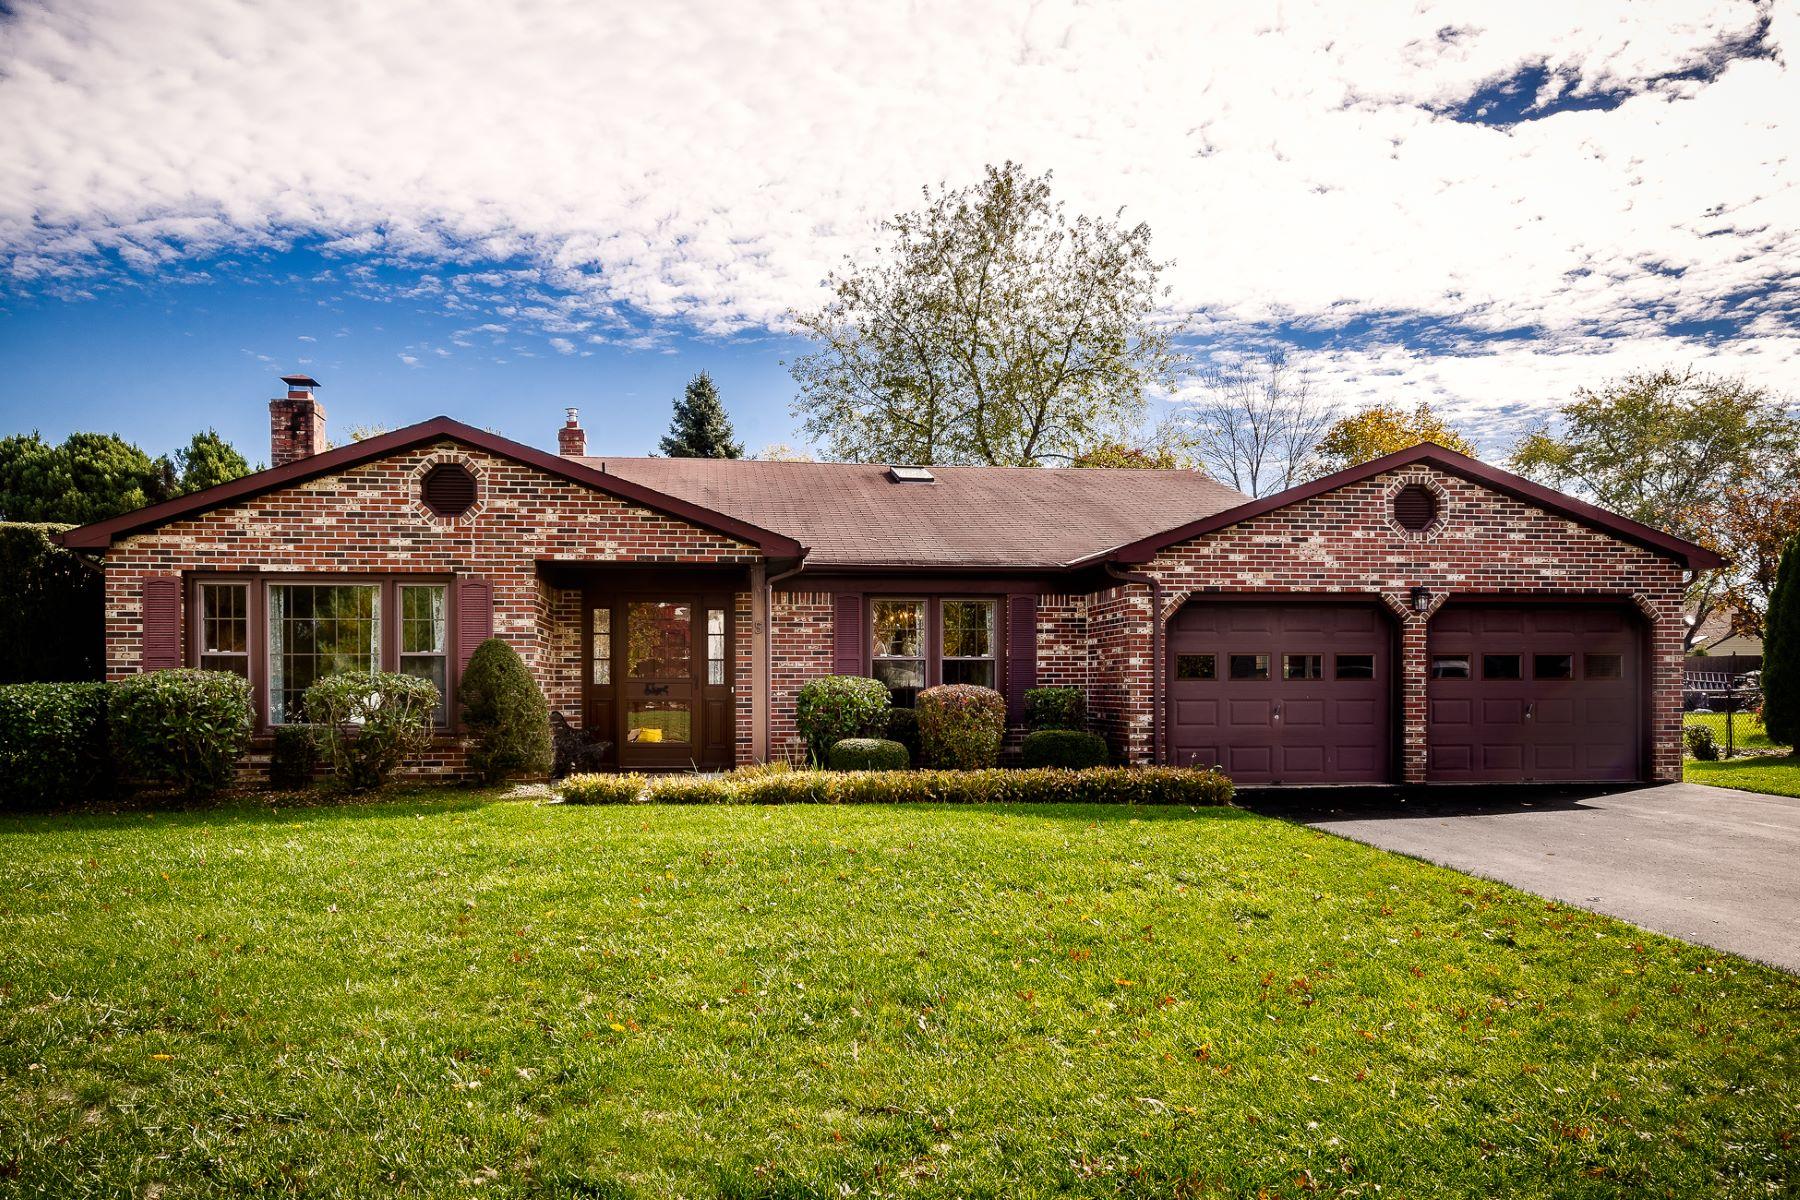 Single Family Home for Sale at Hamilton Home Hits Every Note! 5 Katie Way, Hamilton, New Jersey 08690 United StatesMunicipality: Hamilton Township